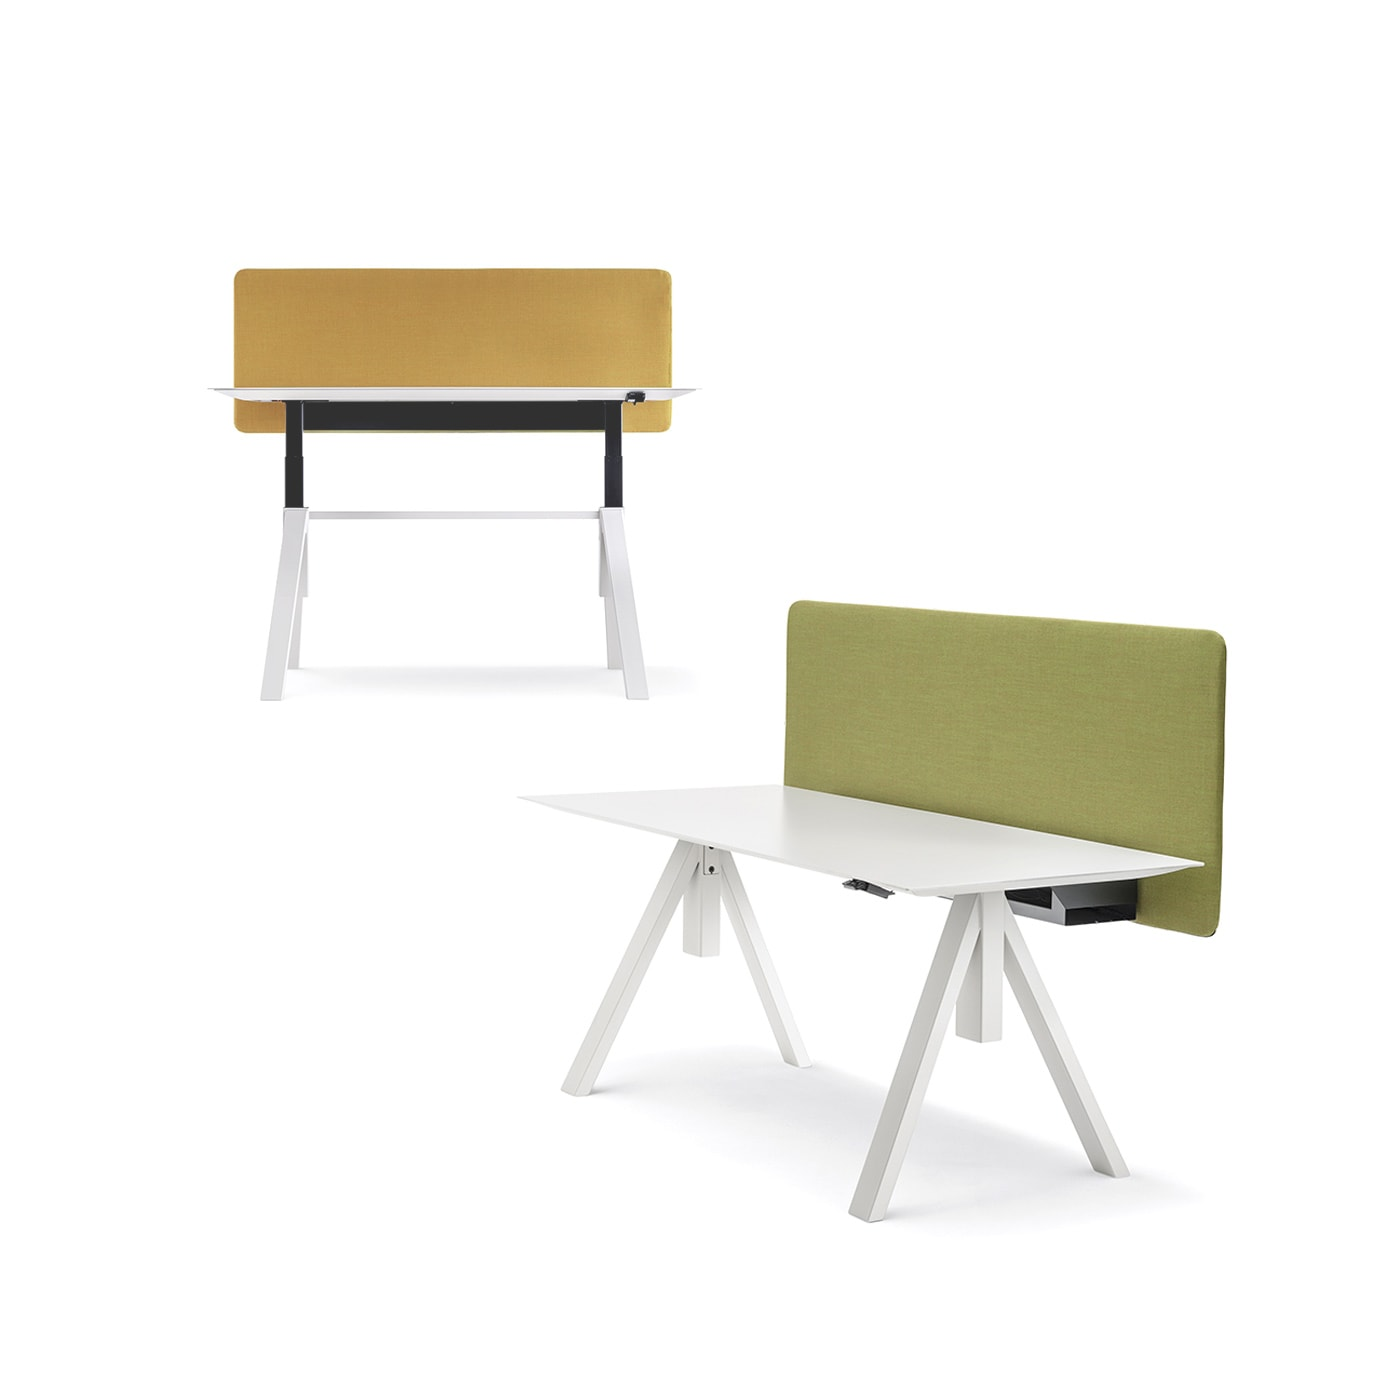 Pedrali-Arki-Table adjustable Desk - vendita online